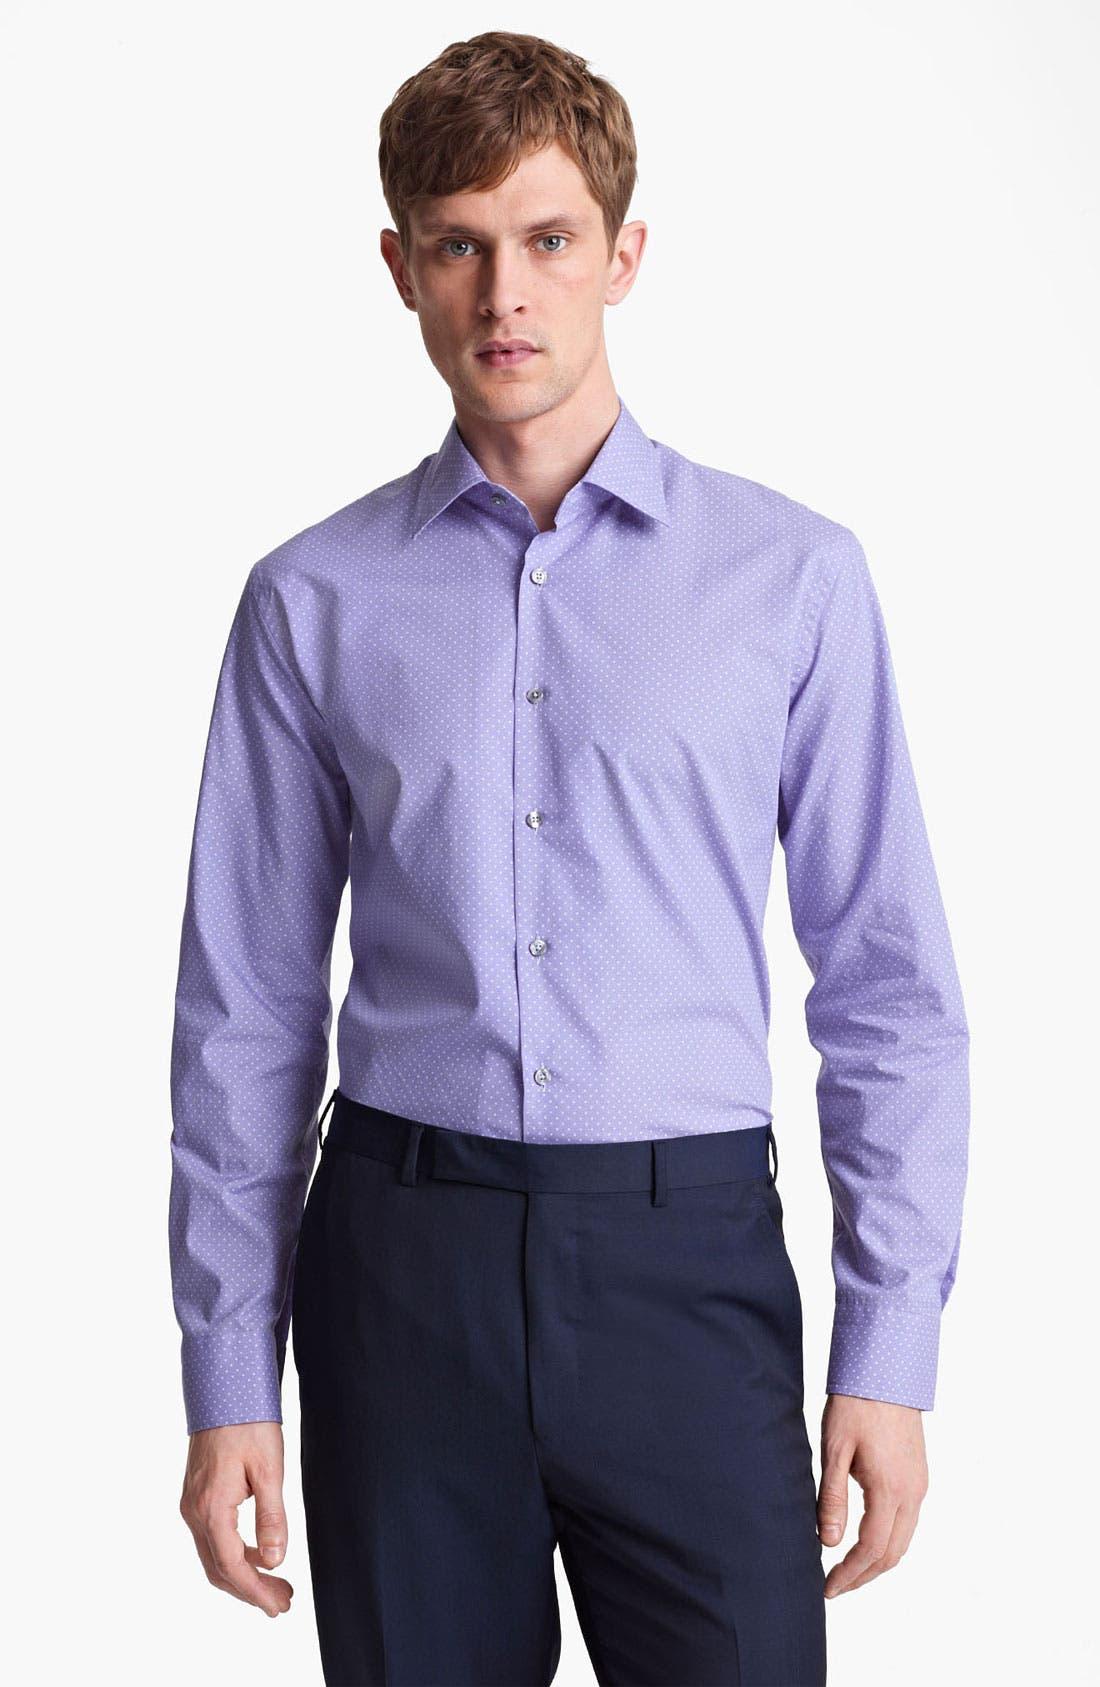 Alternate Image 1 Selected - Paul Smith London Pin Dot Dress Shirt